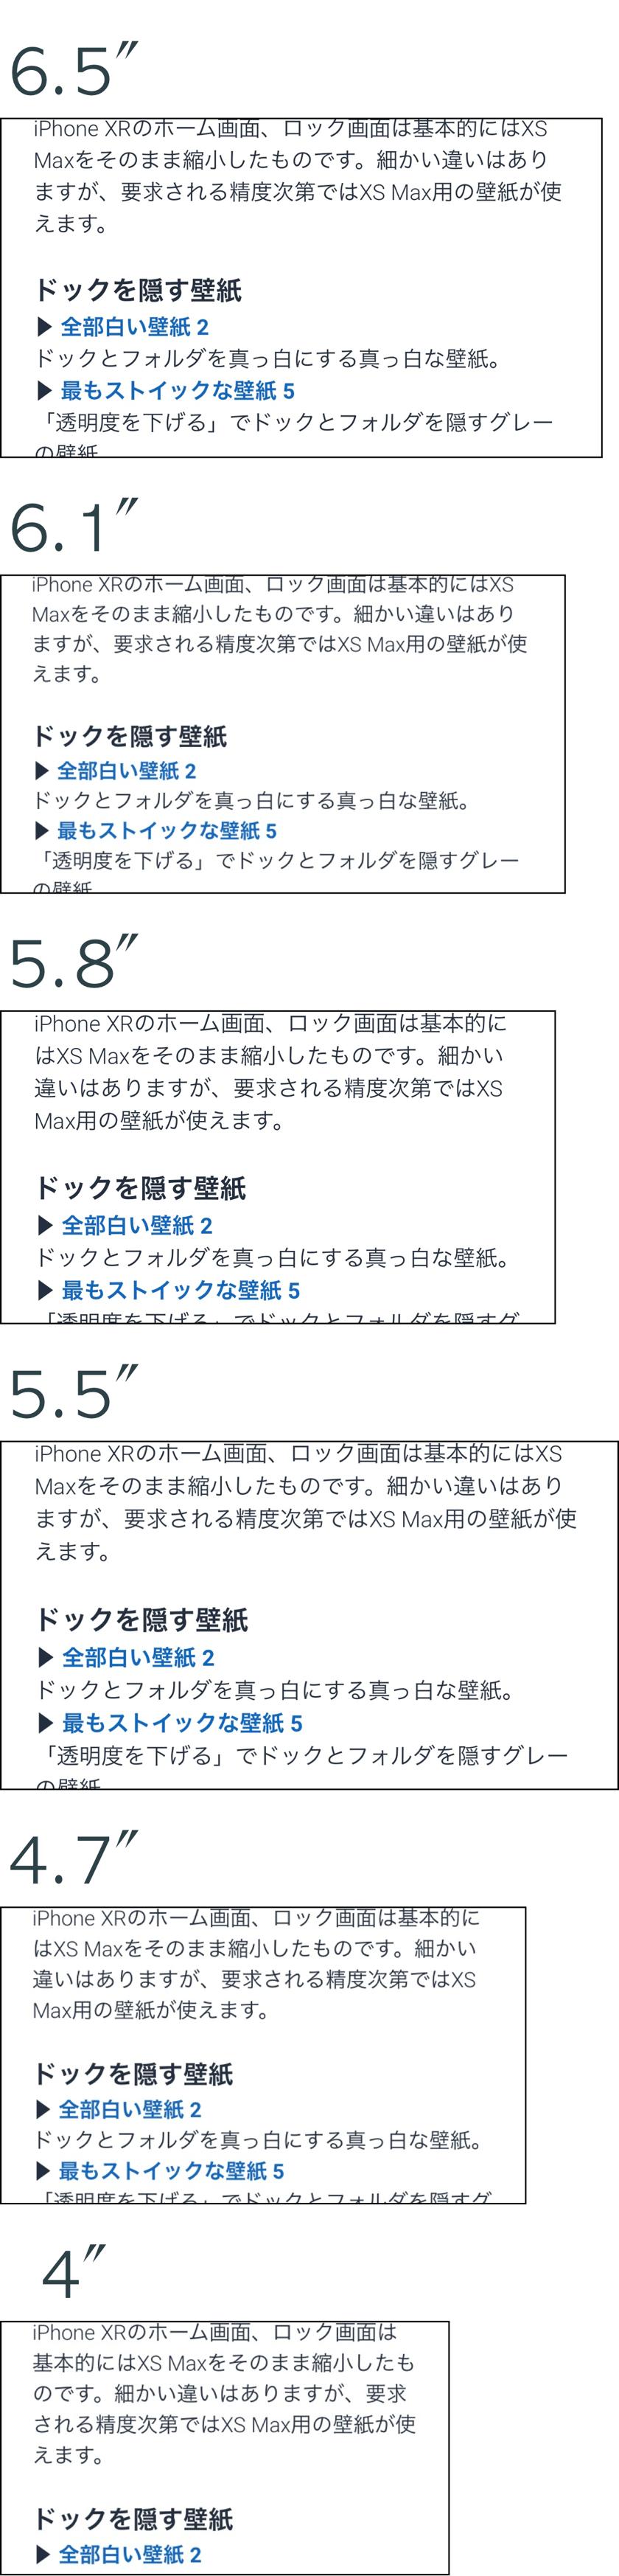 Iphone Xrの拡大表示ではx Xs用のxスタイルの壁紙が使えます 不思議なiphone壁紙のブログ